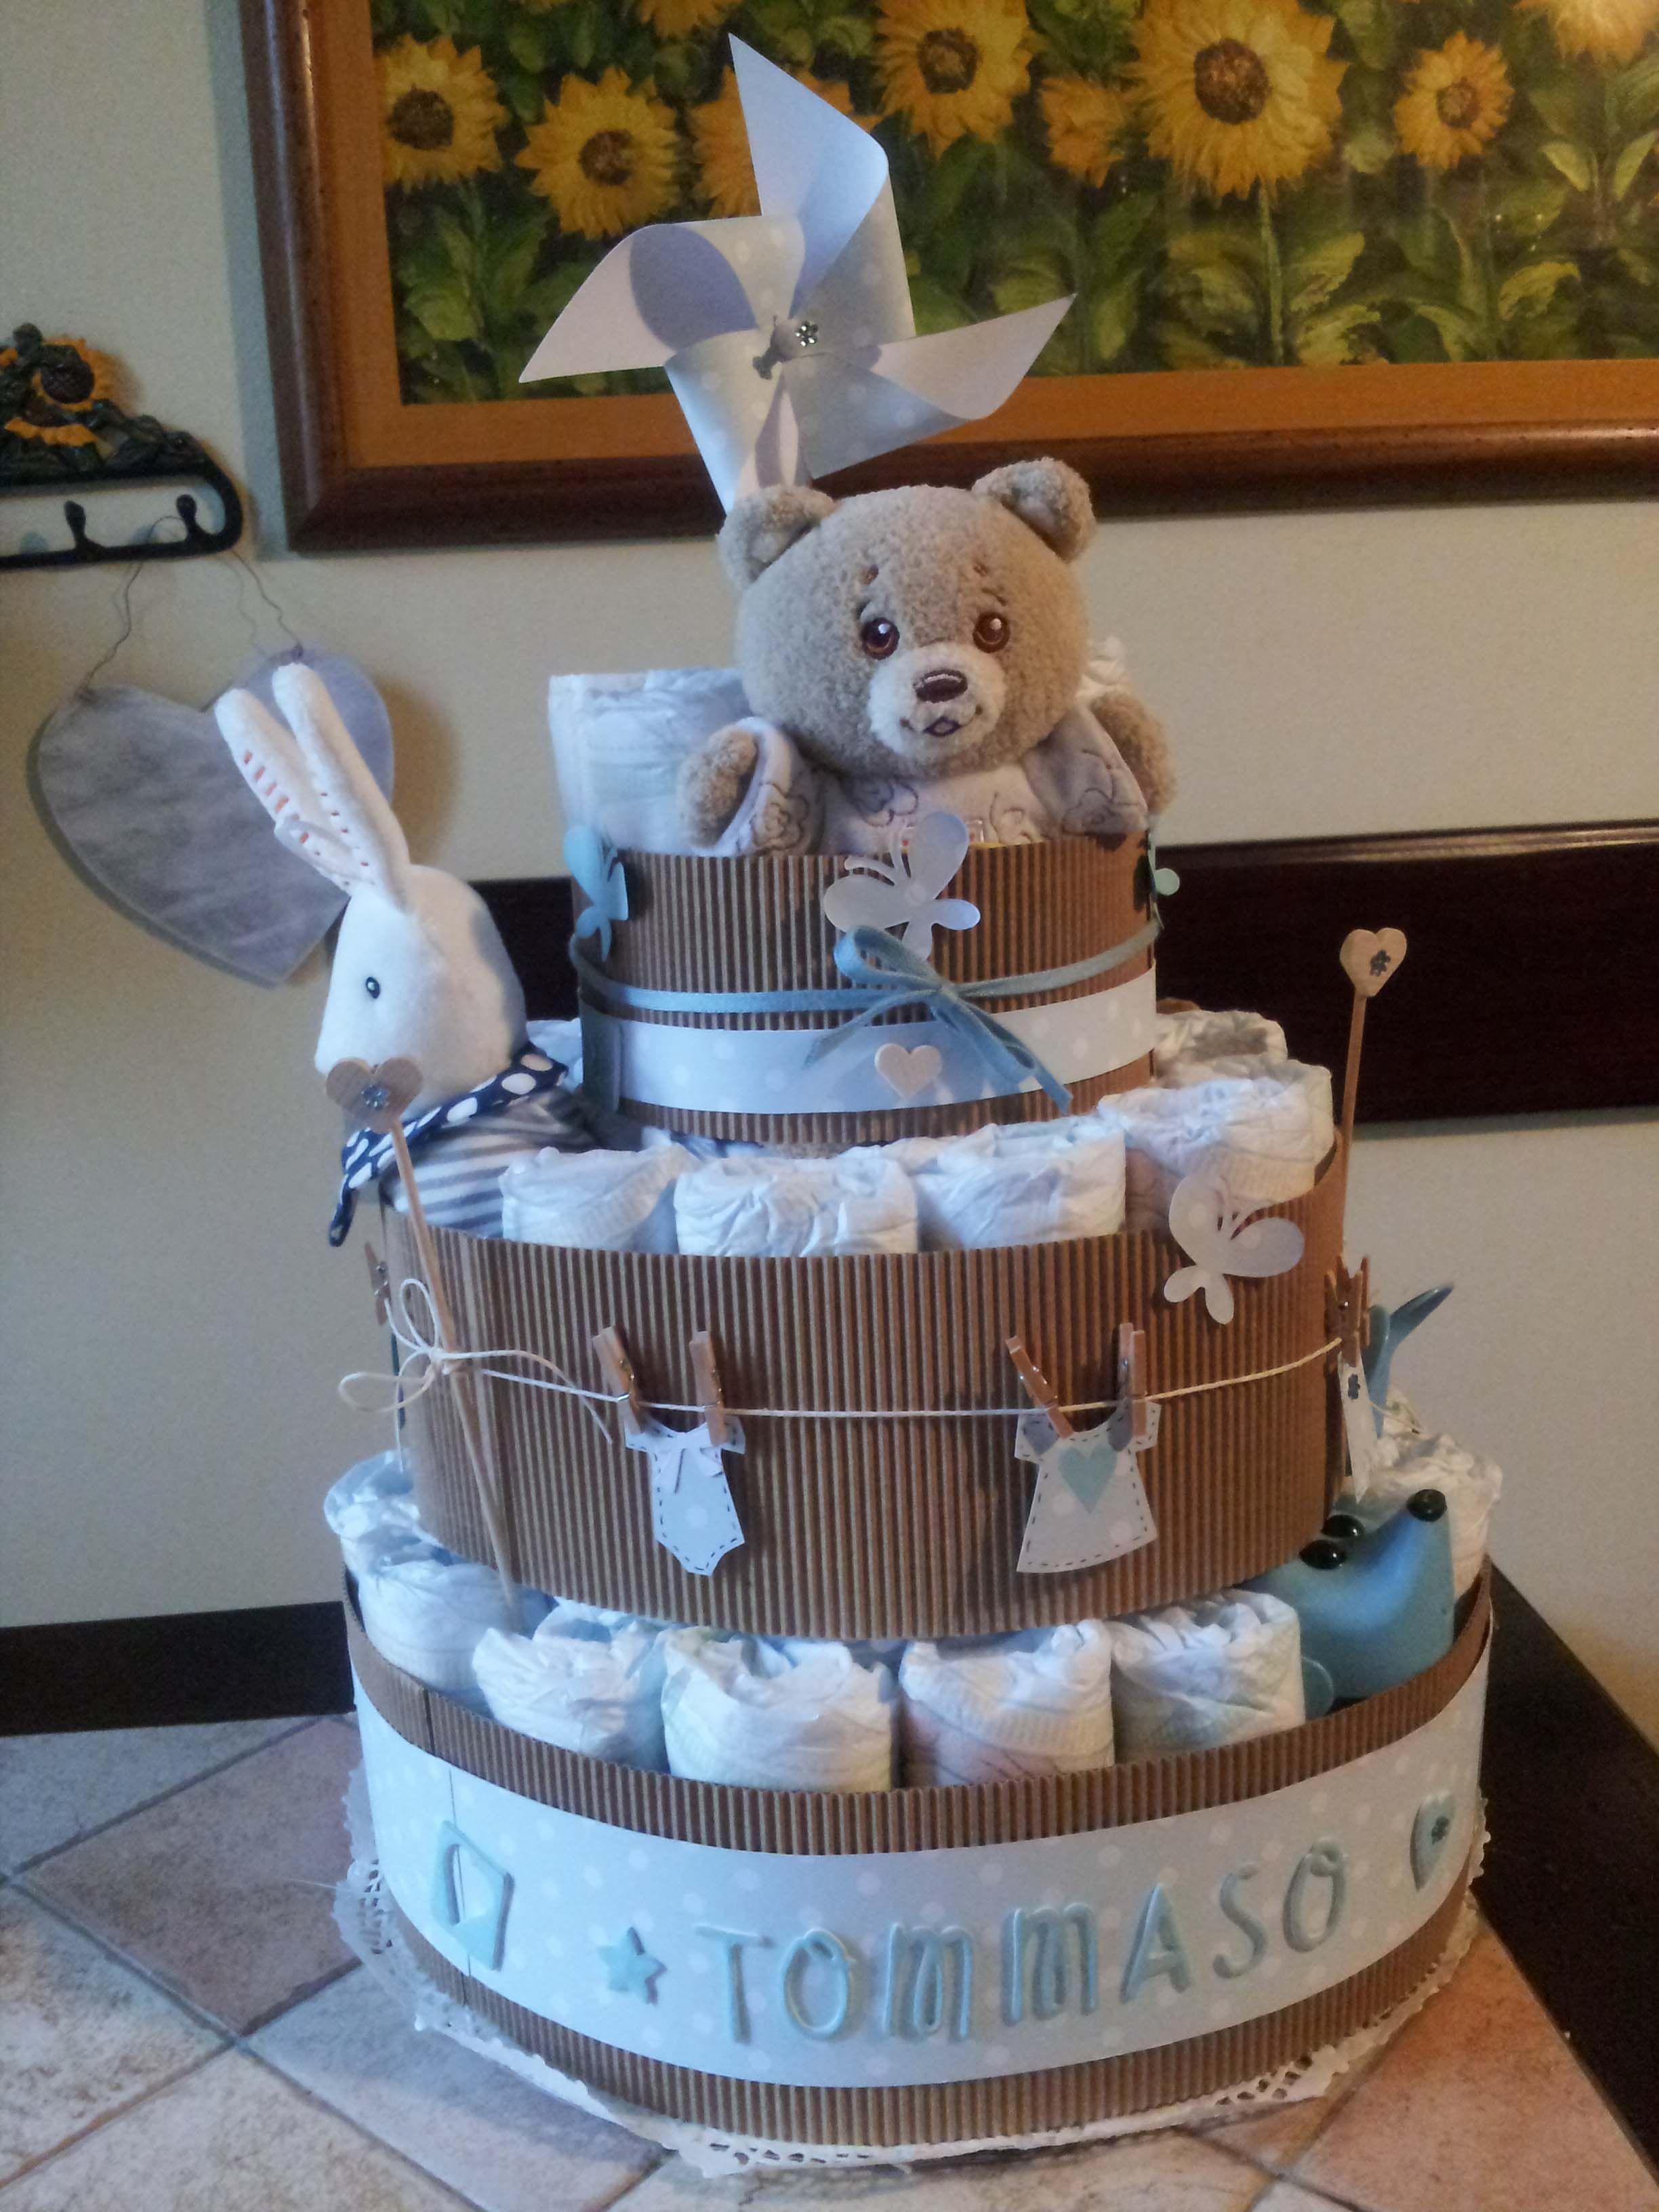 Torta Di Pannolini Torta Di Pannolini Pannolini Bambini Pannolino